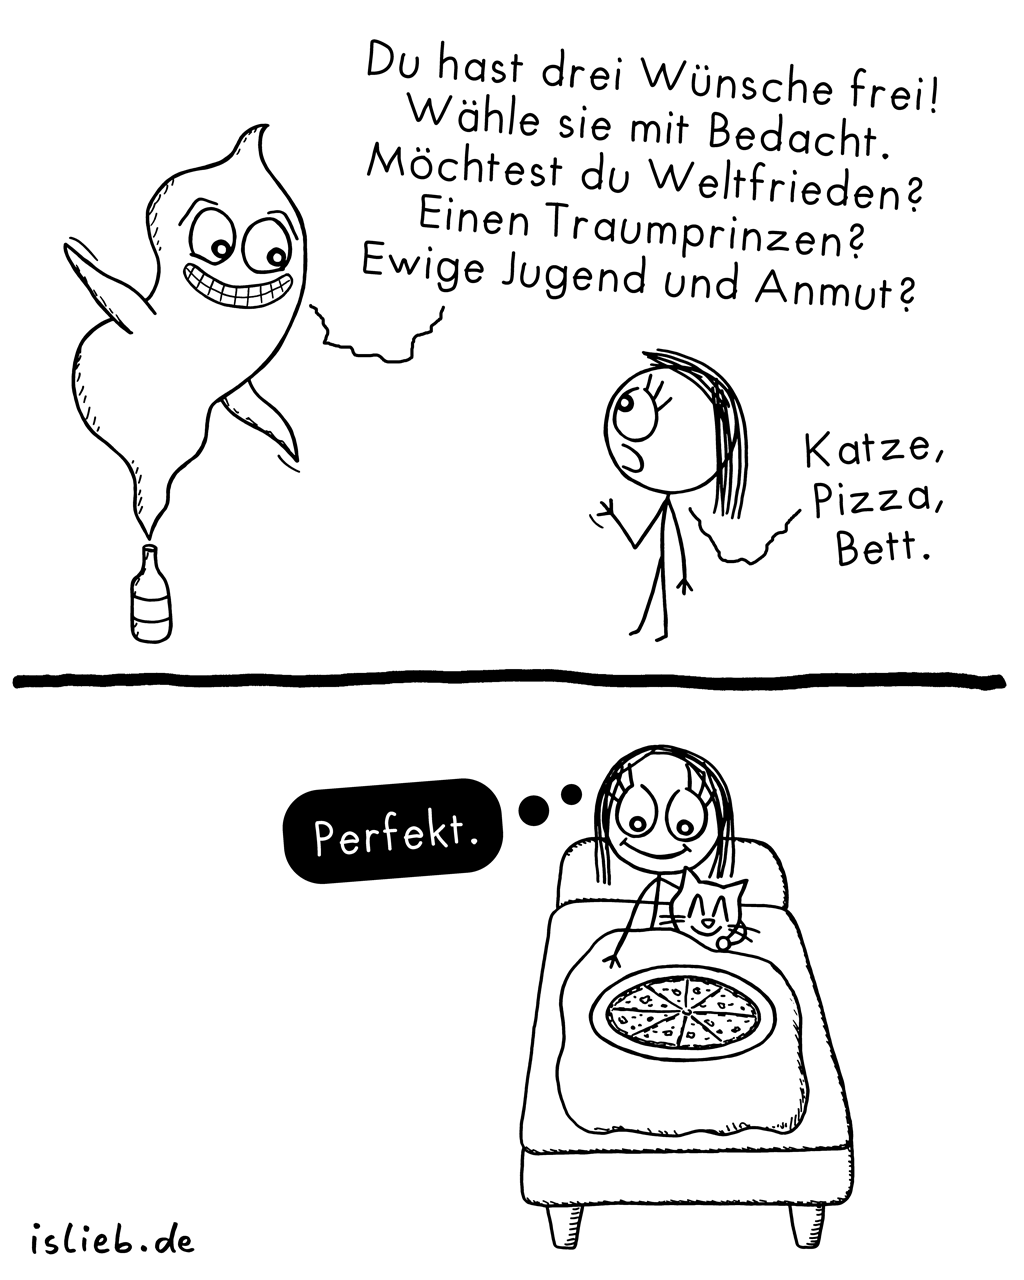 Drei Wünsche | Flaschengeist-Comic | is lieb?